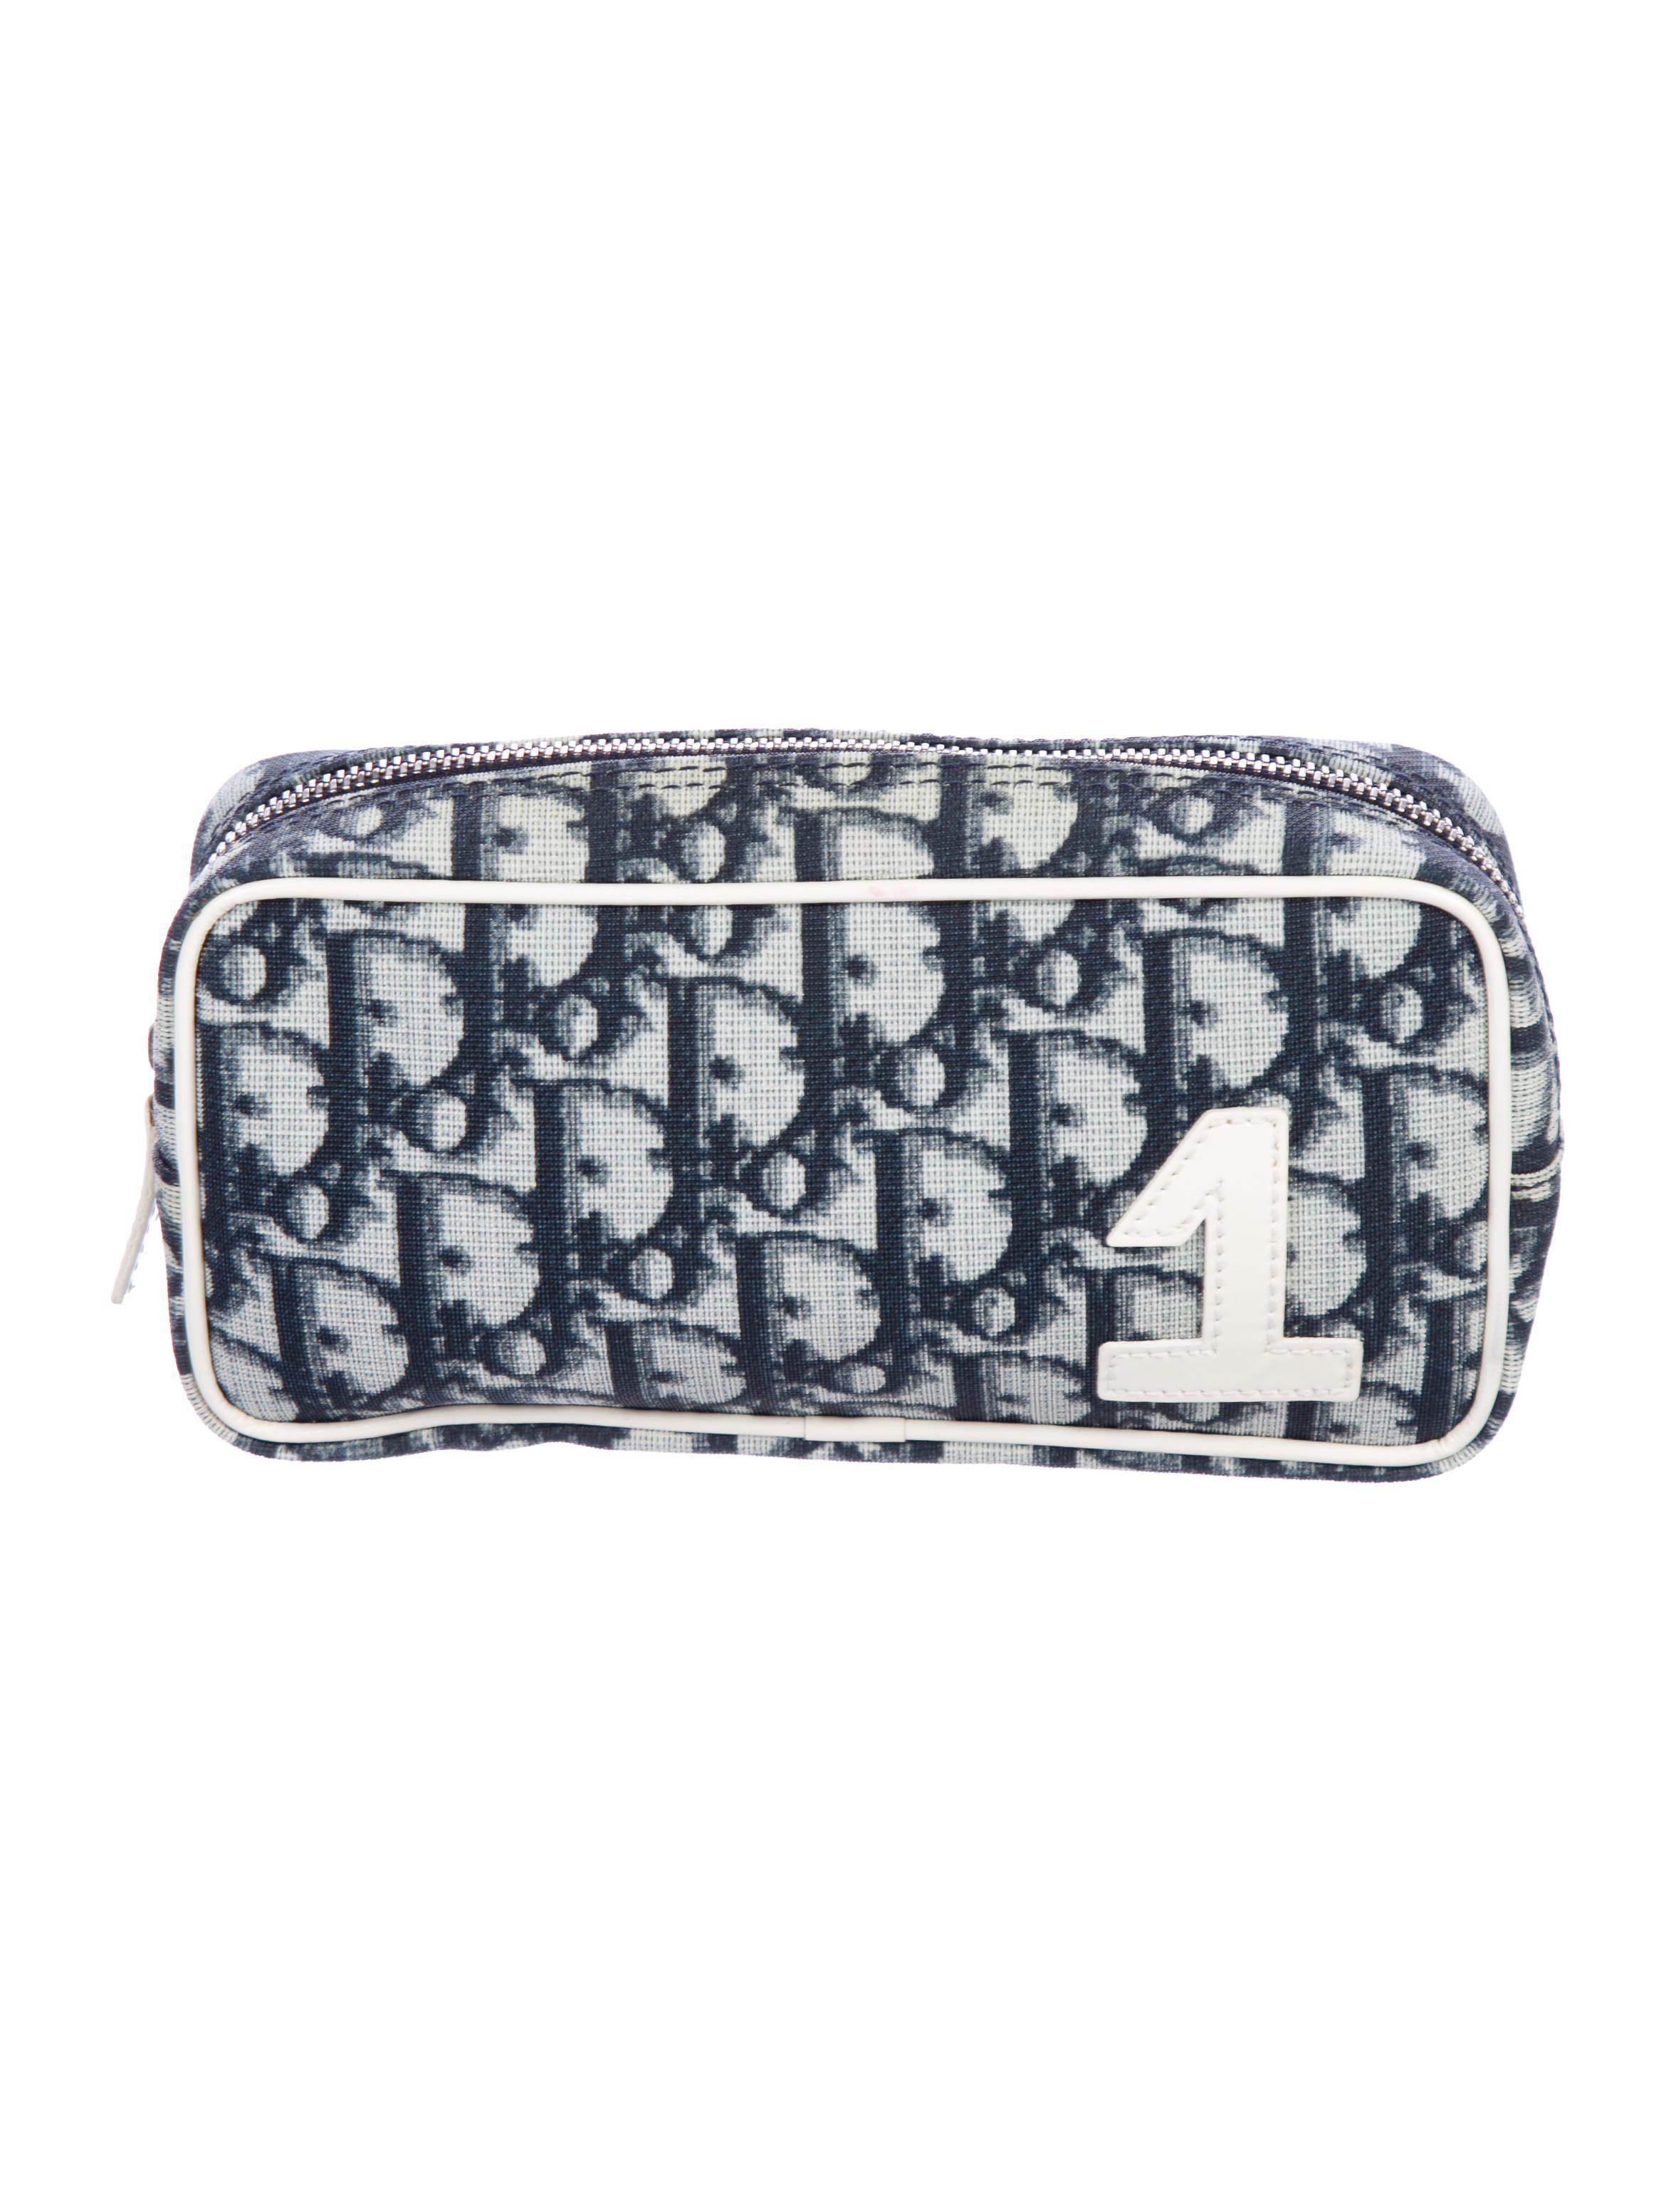 d2b4c4013b29 Lyst - Dior Diorissmio Cosmetic Bag Blue in Metallic - Save 58%